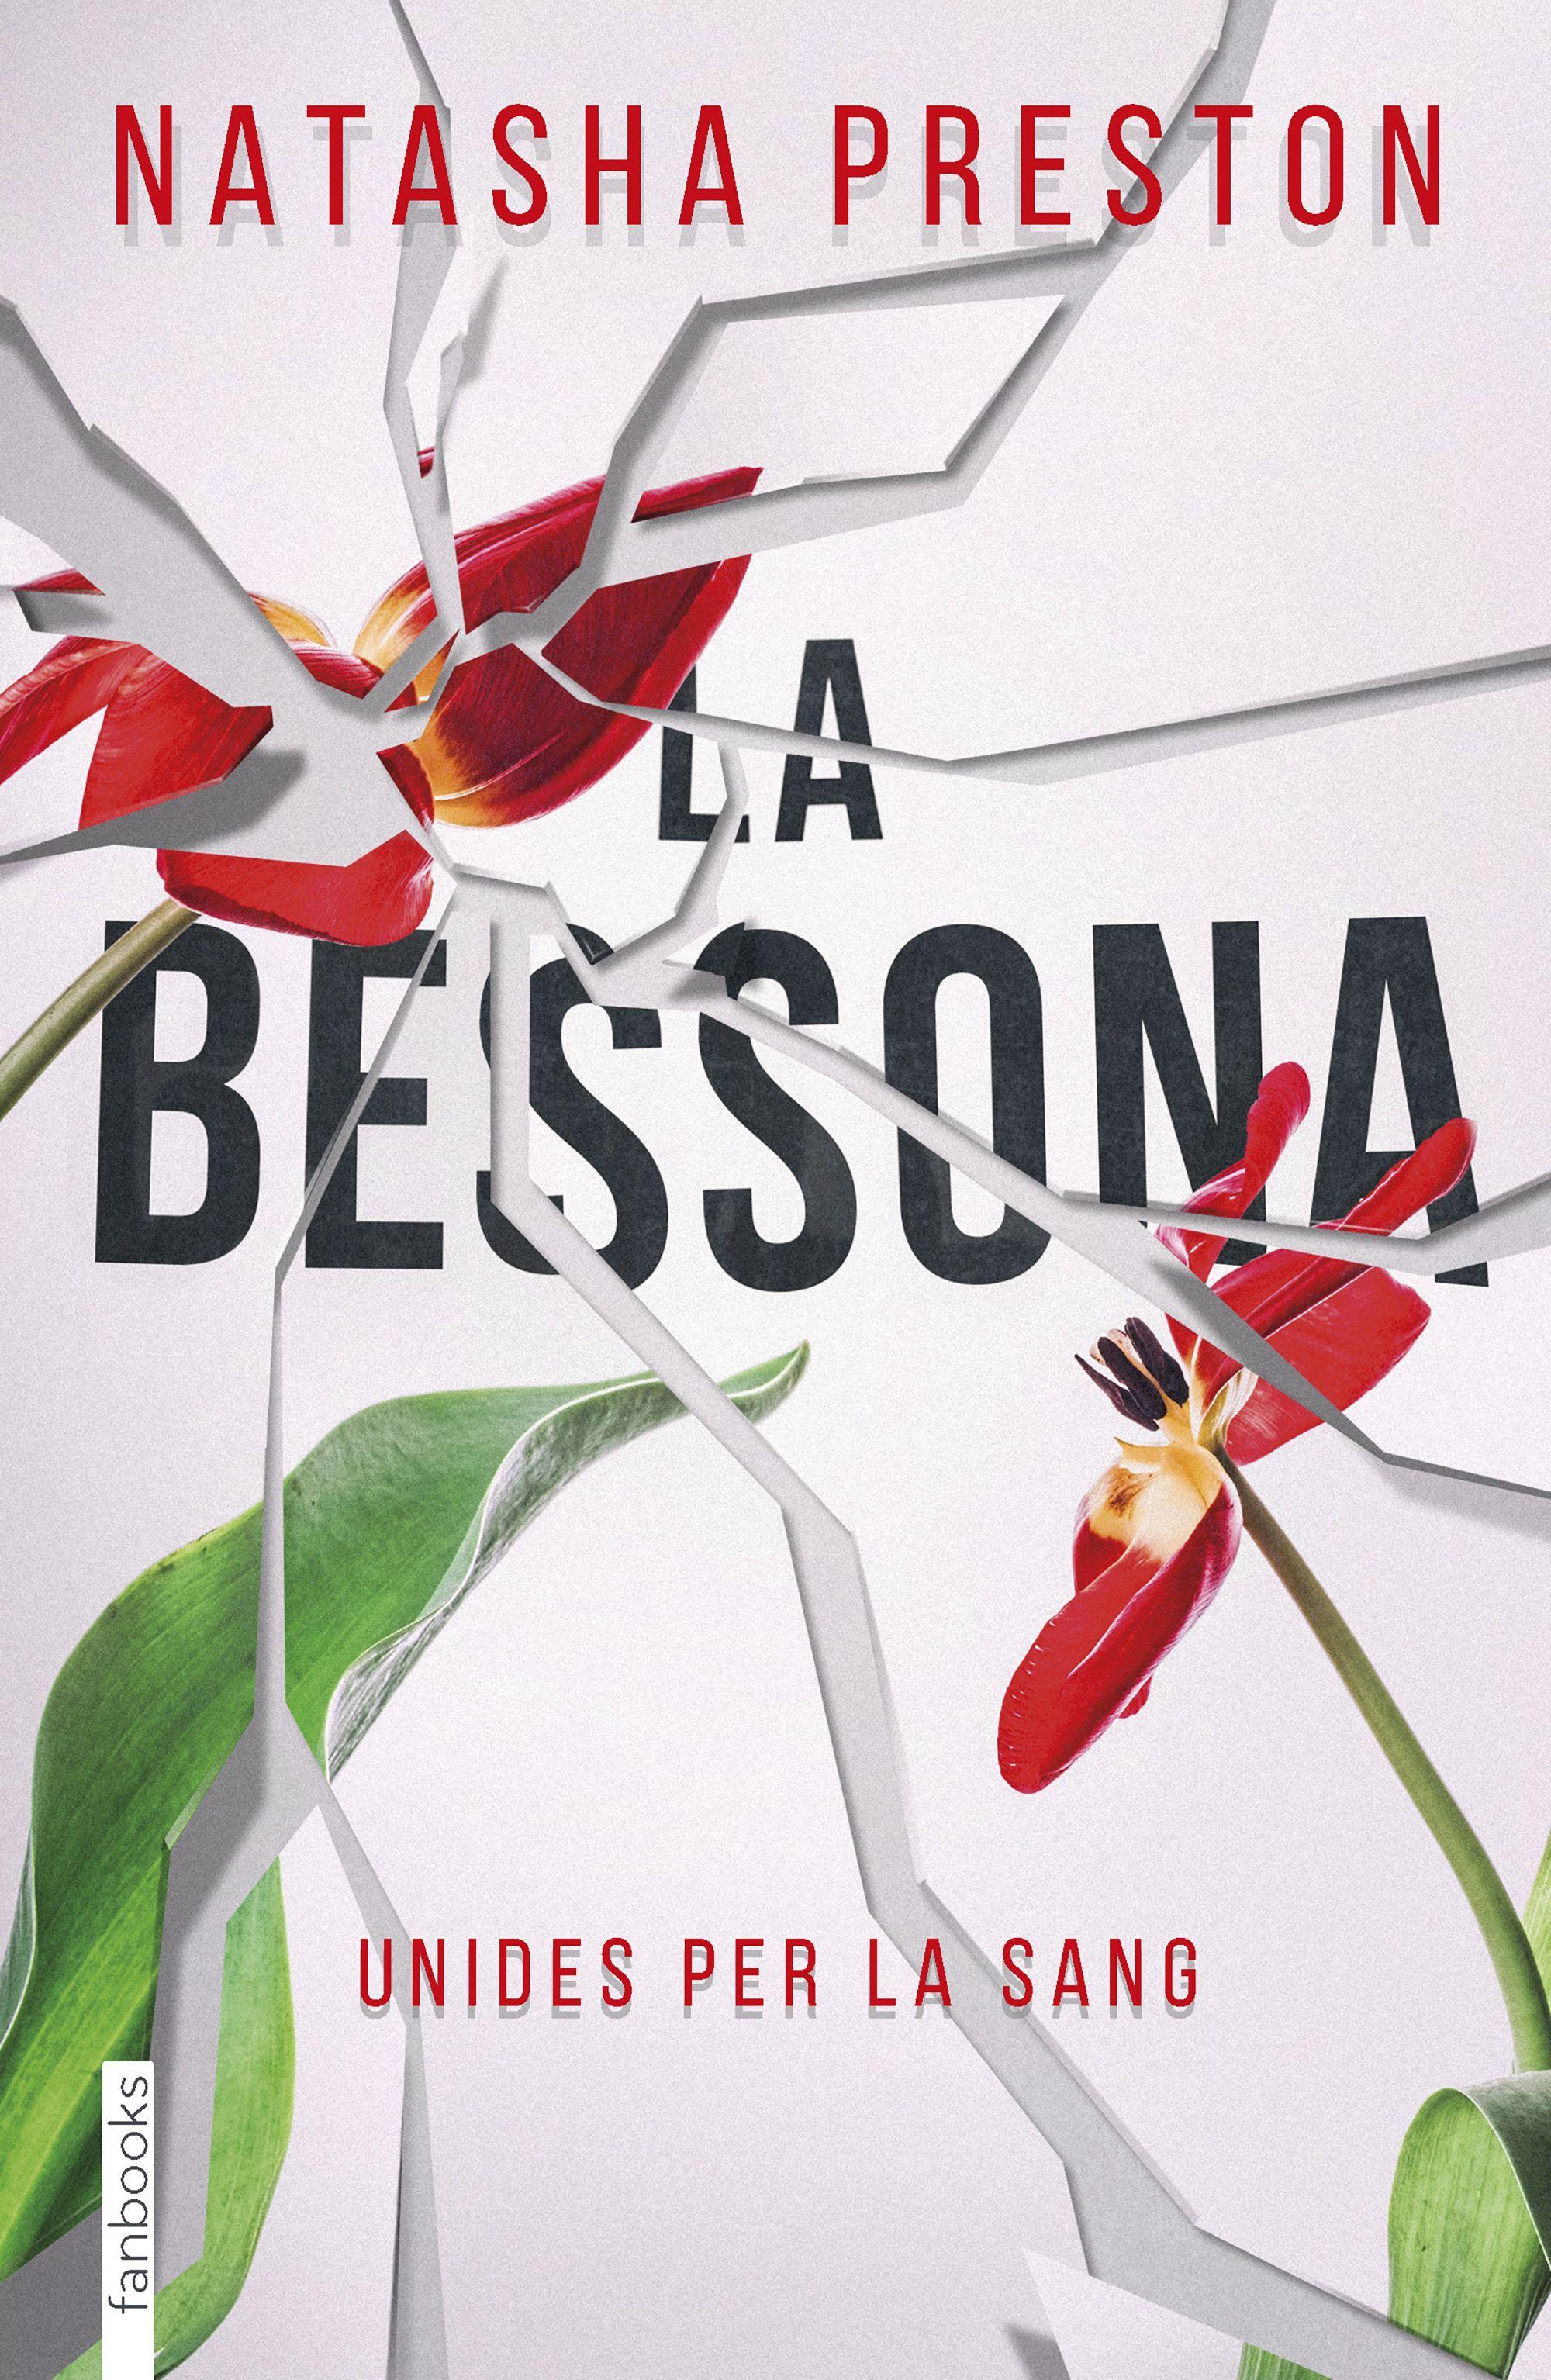 BESSONA LA